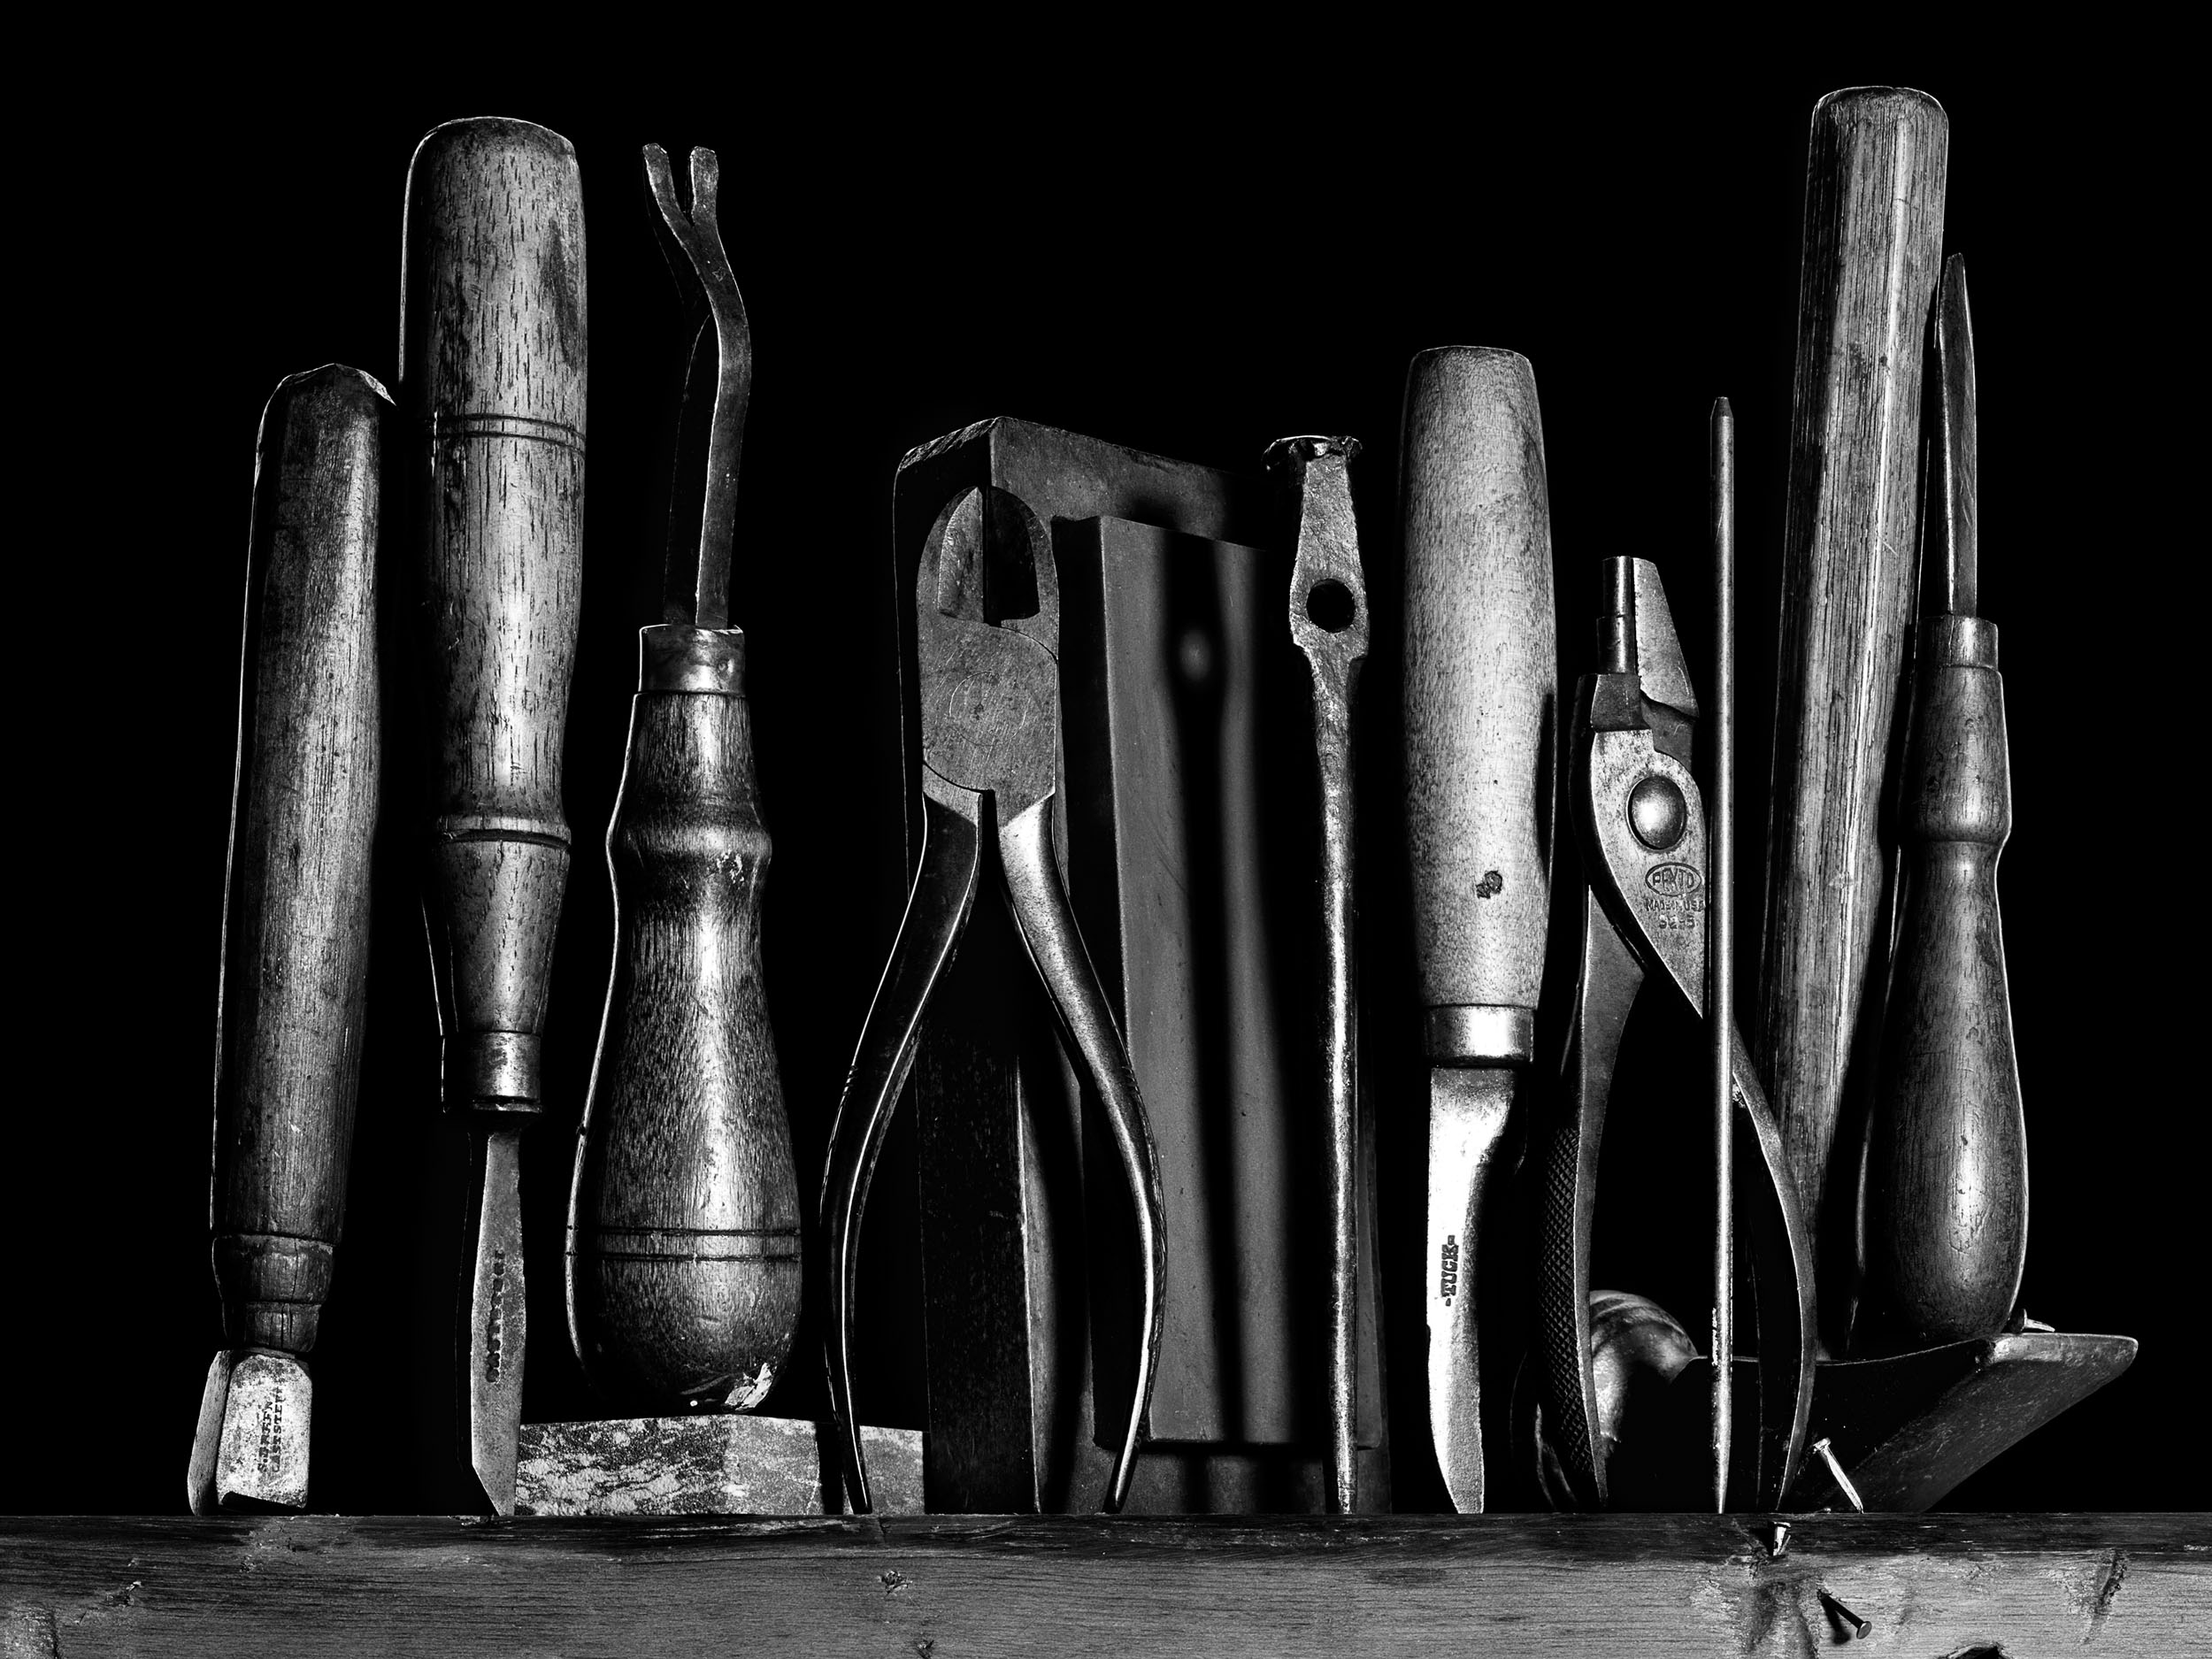 tools_094_RS.jpg